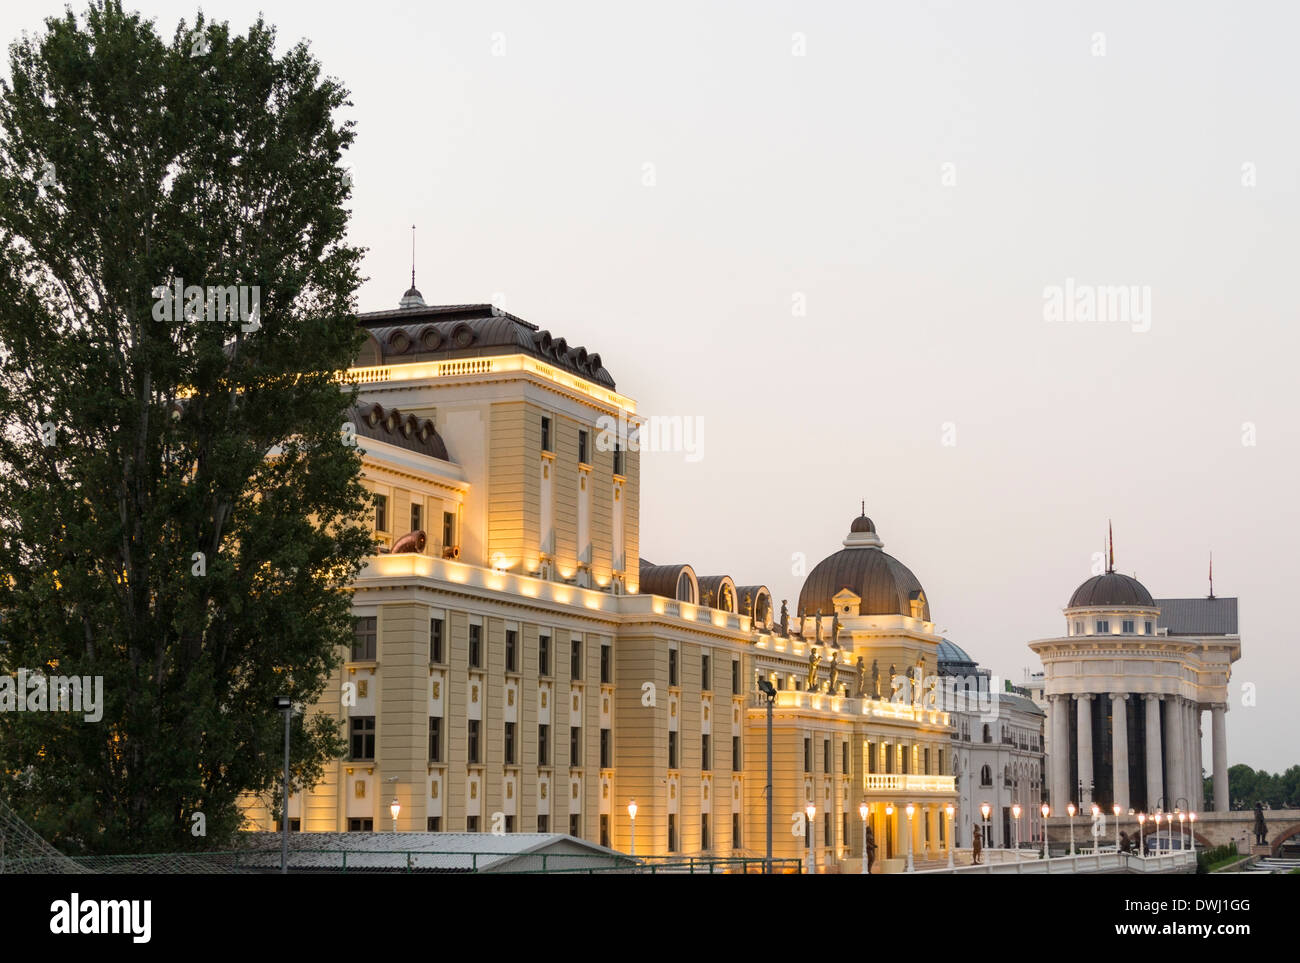 Museum of the Macedonian Struggle, Skopje, Macedonia - Stock Image